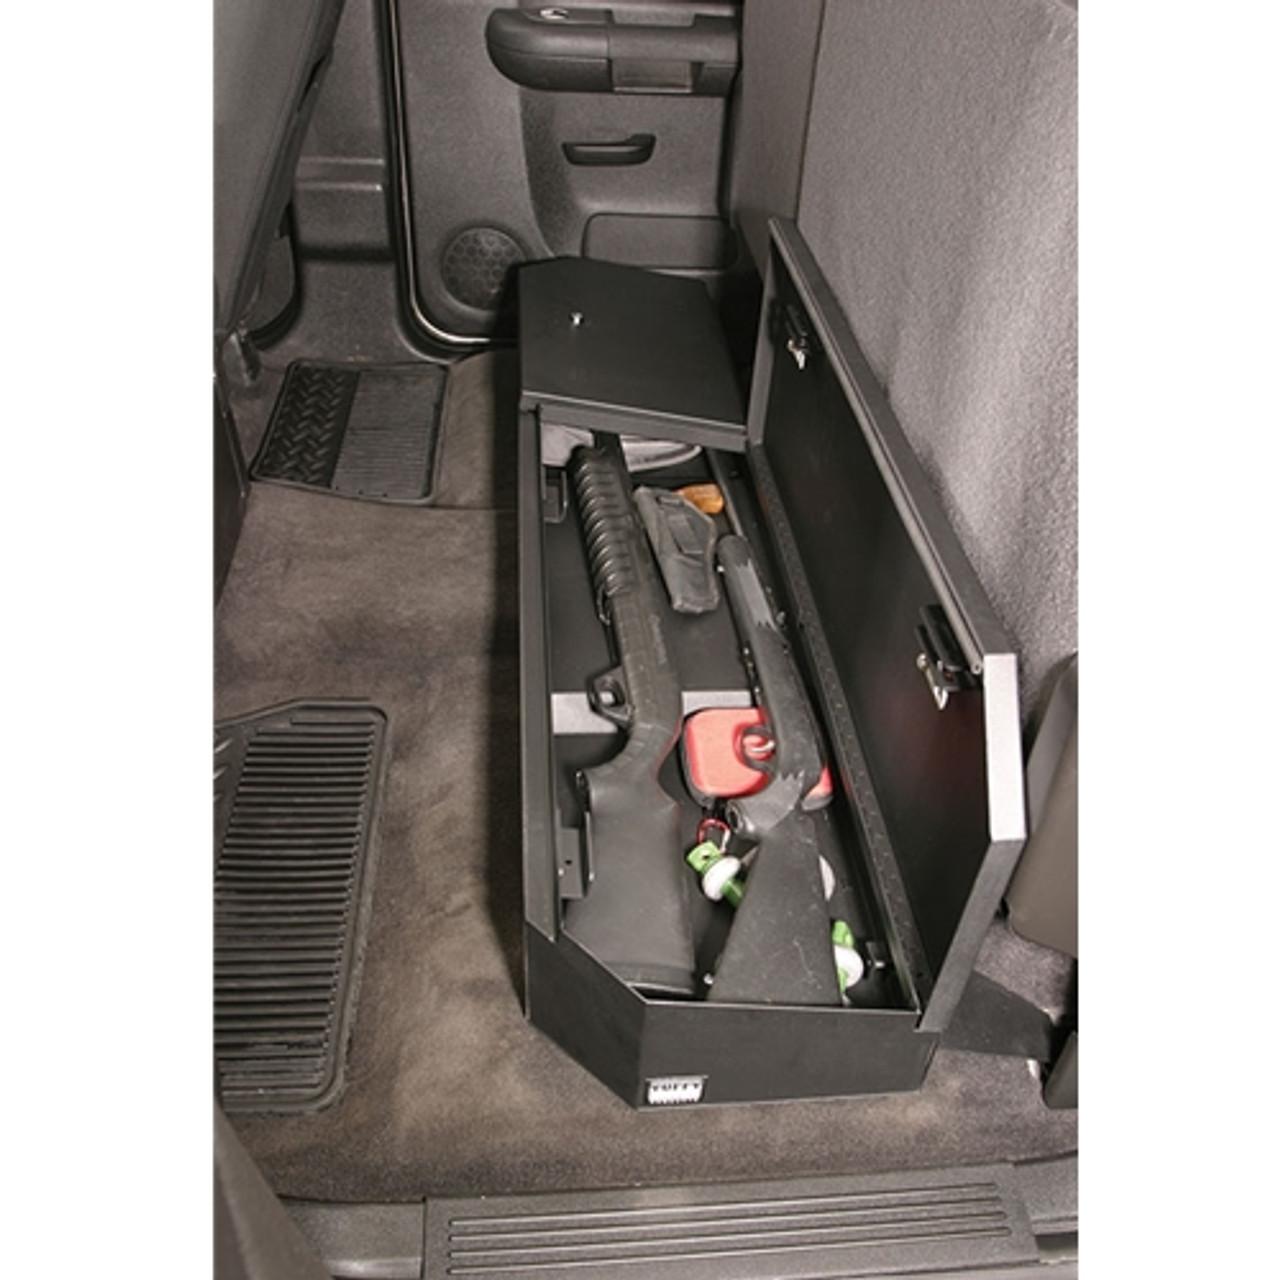 Marvelous Chevy Silverado Rear Seat Storage Organizer Lock Box Pdpeps Interior Chair Design Pdpepsorg